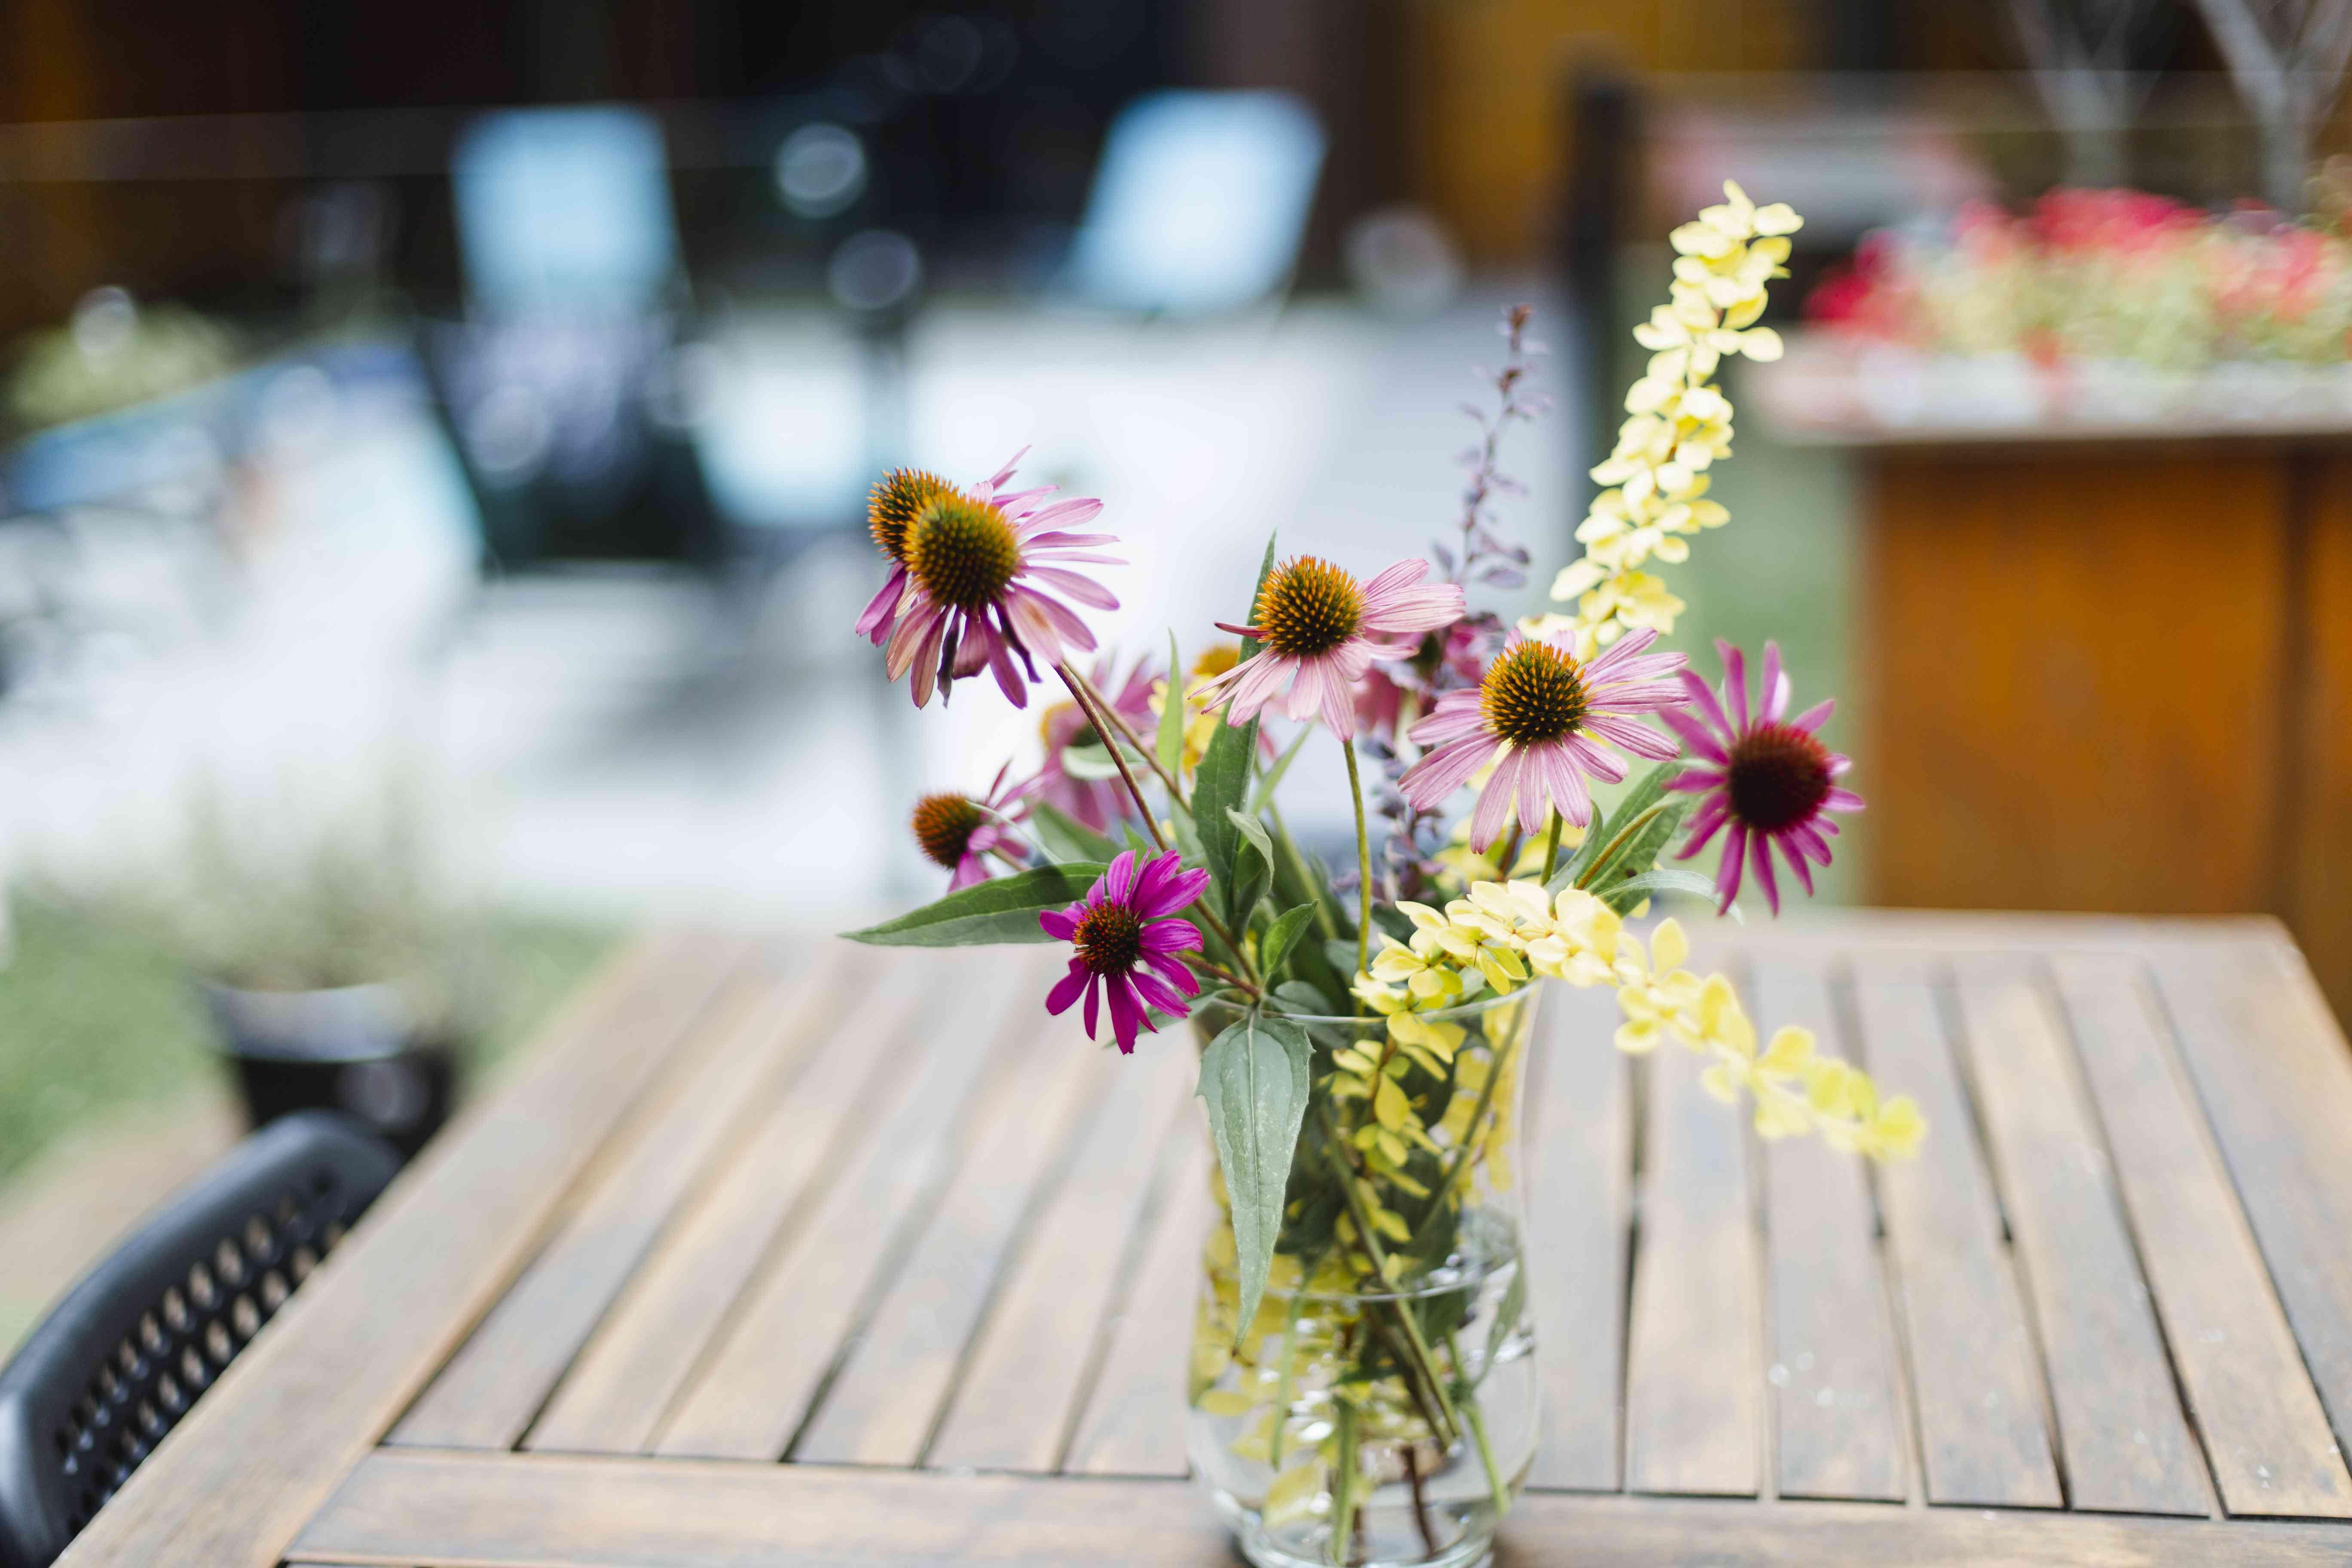 Ramo de flores silvestres en una mesa al aire libre